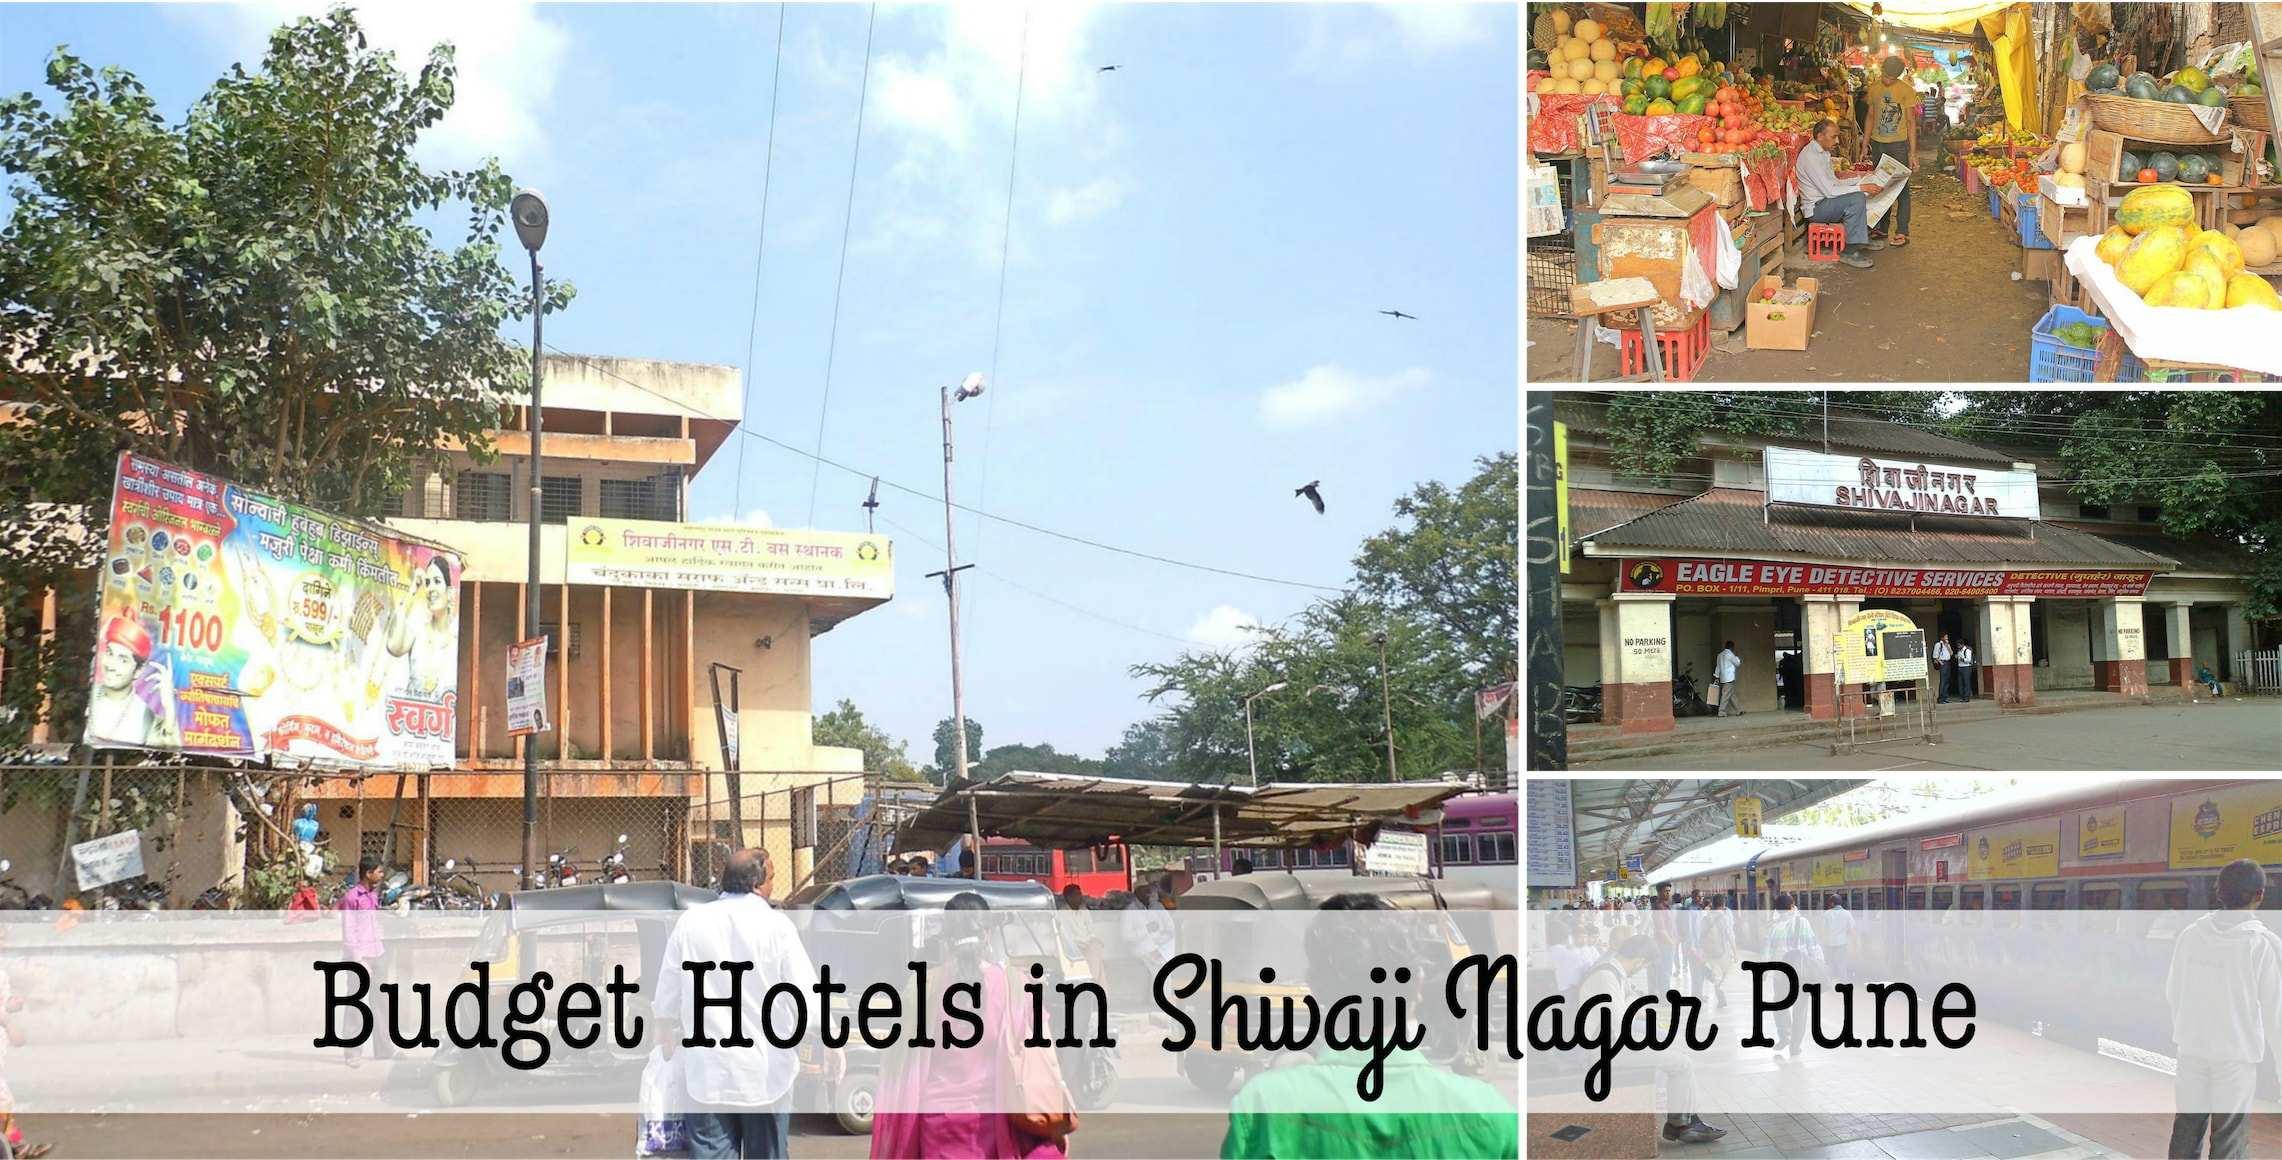 hotels-in-shivaji-nagar-pune-maharashtra.